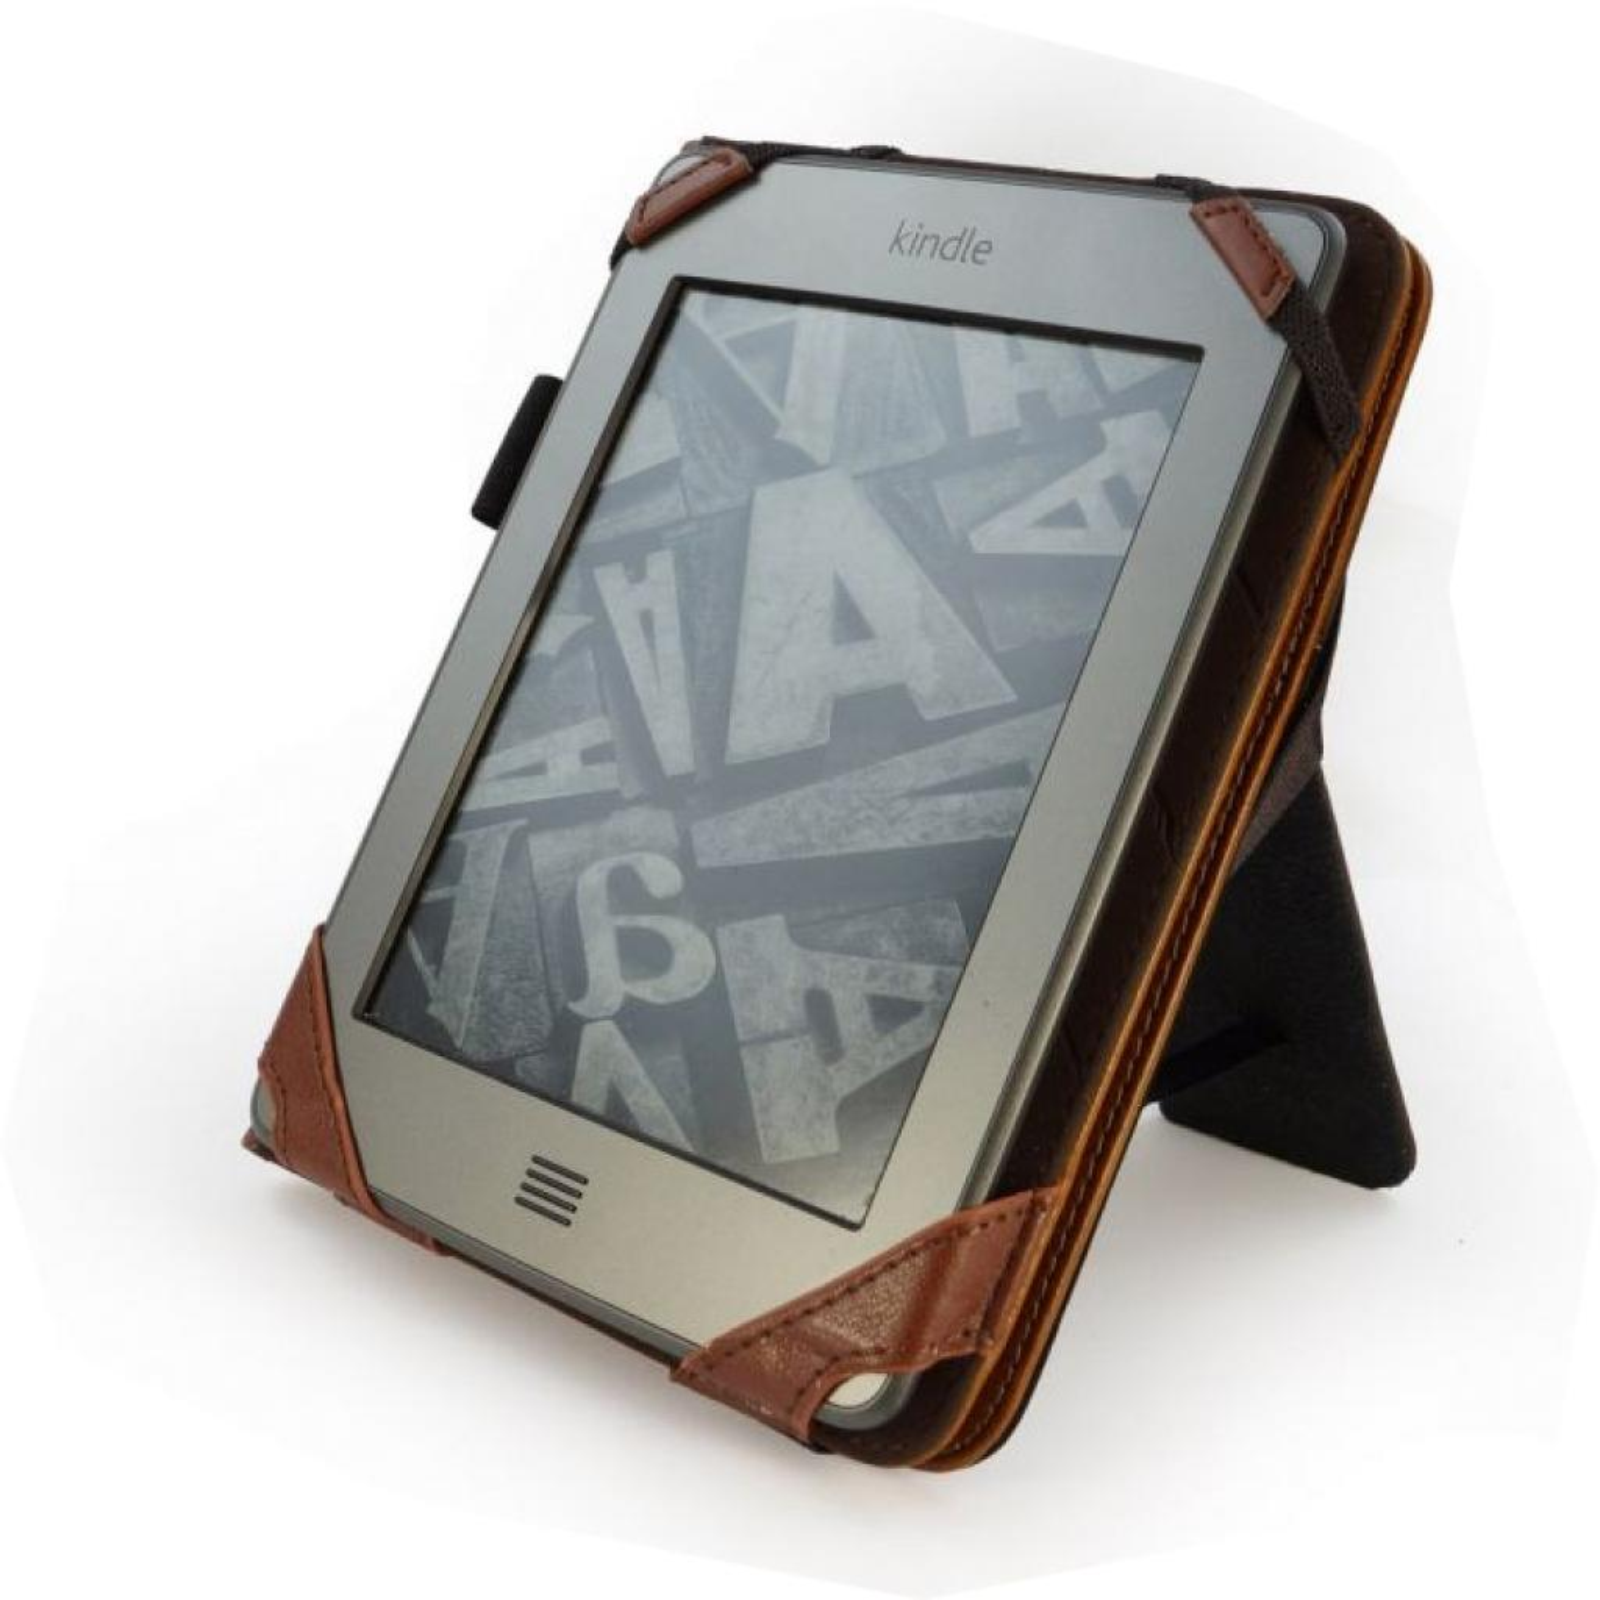 Чехол для электронной книги Tuff-Luv 6 Embrace Plus Leather Vintage Brown (A10_41) изображение 3